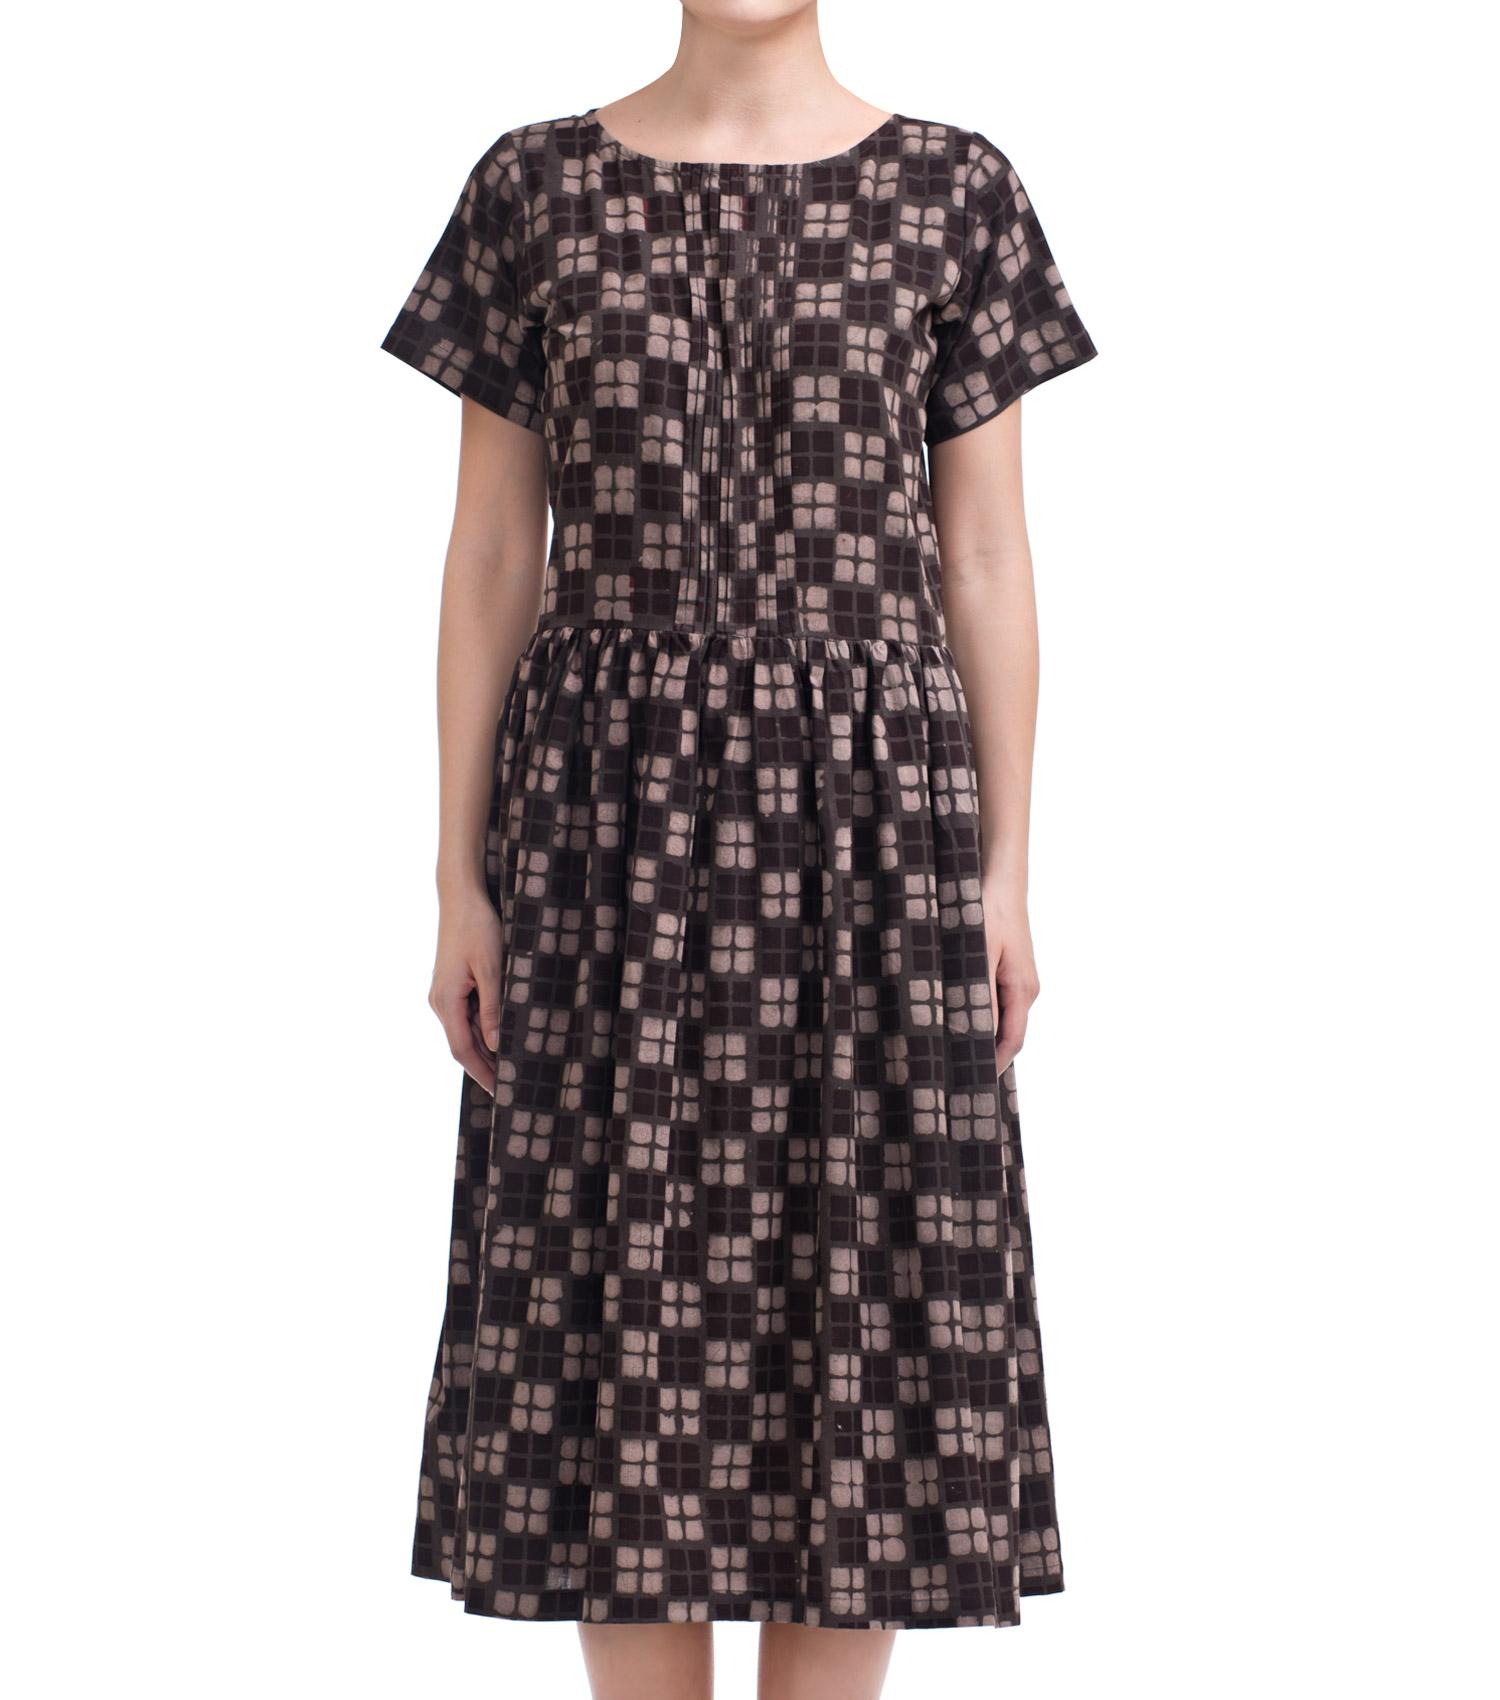 Tesselated brown dress